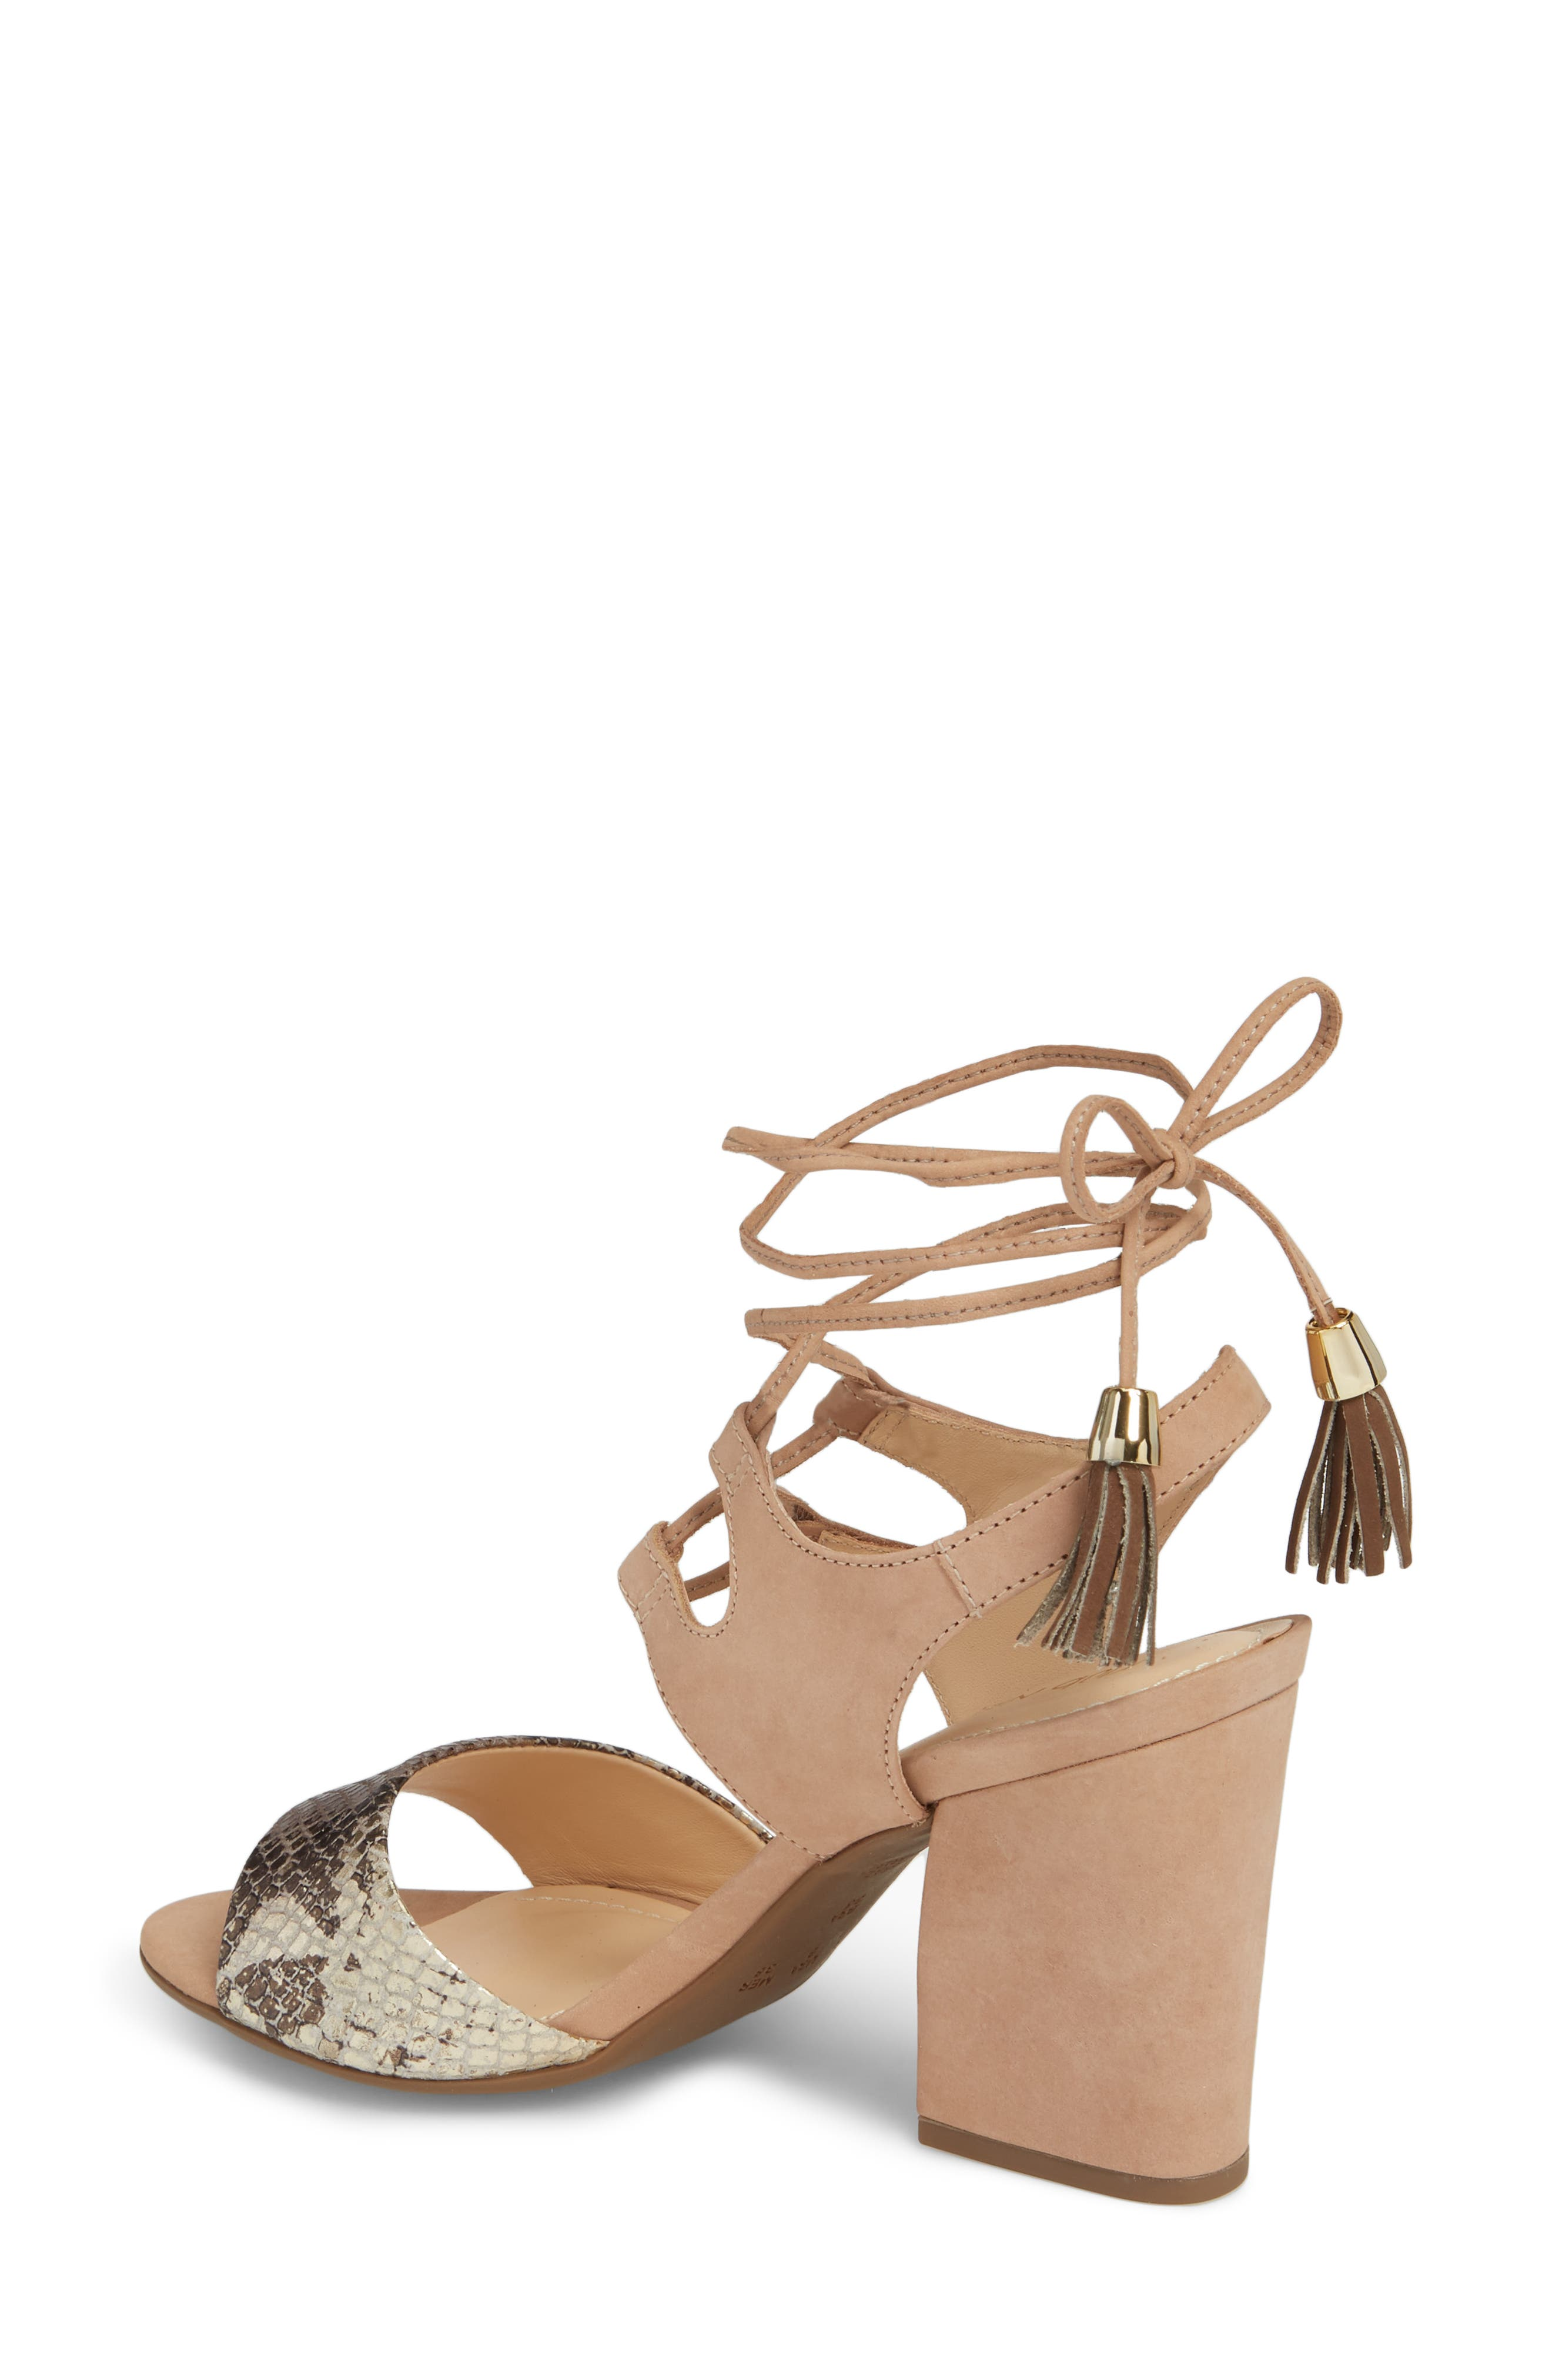 Kaira Ankle Wrap Sandal,                             Alternate thumbnail 2, color,                             Snake Print Leather